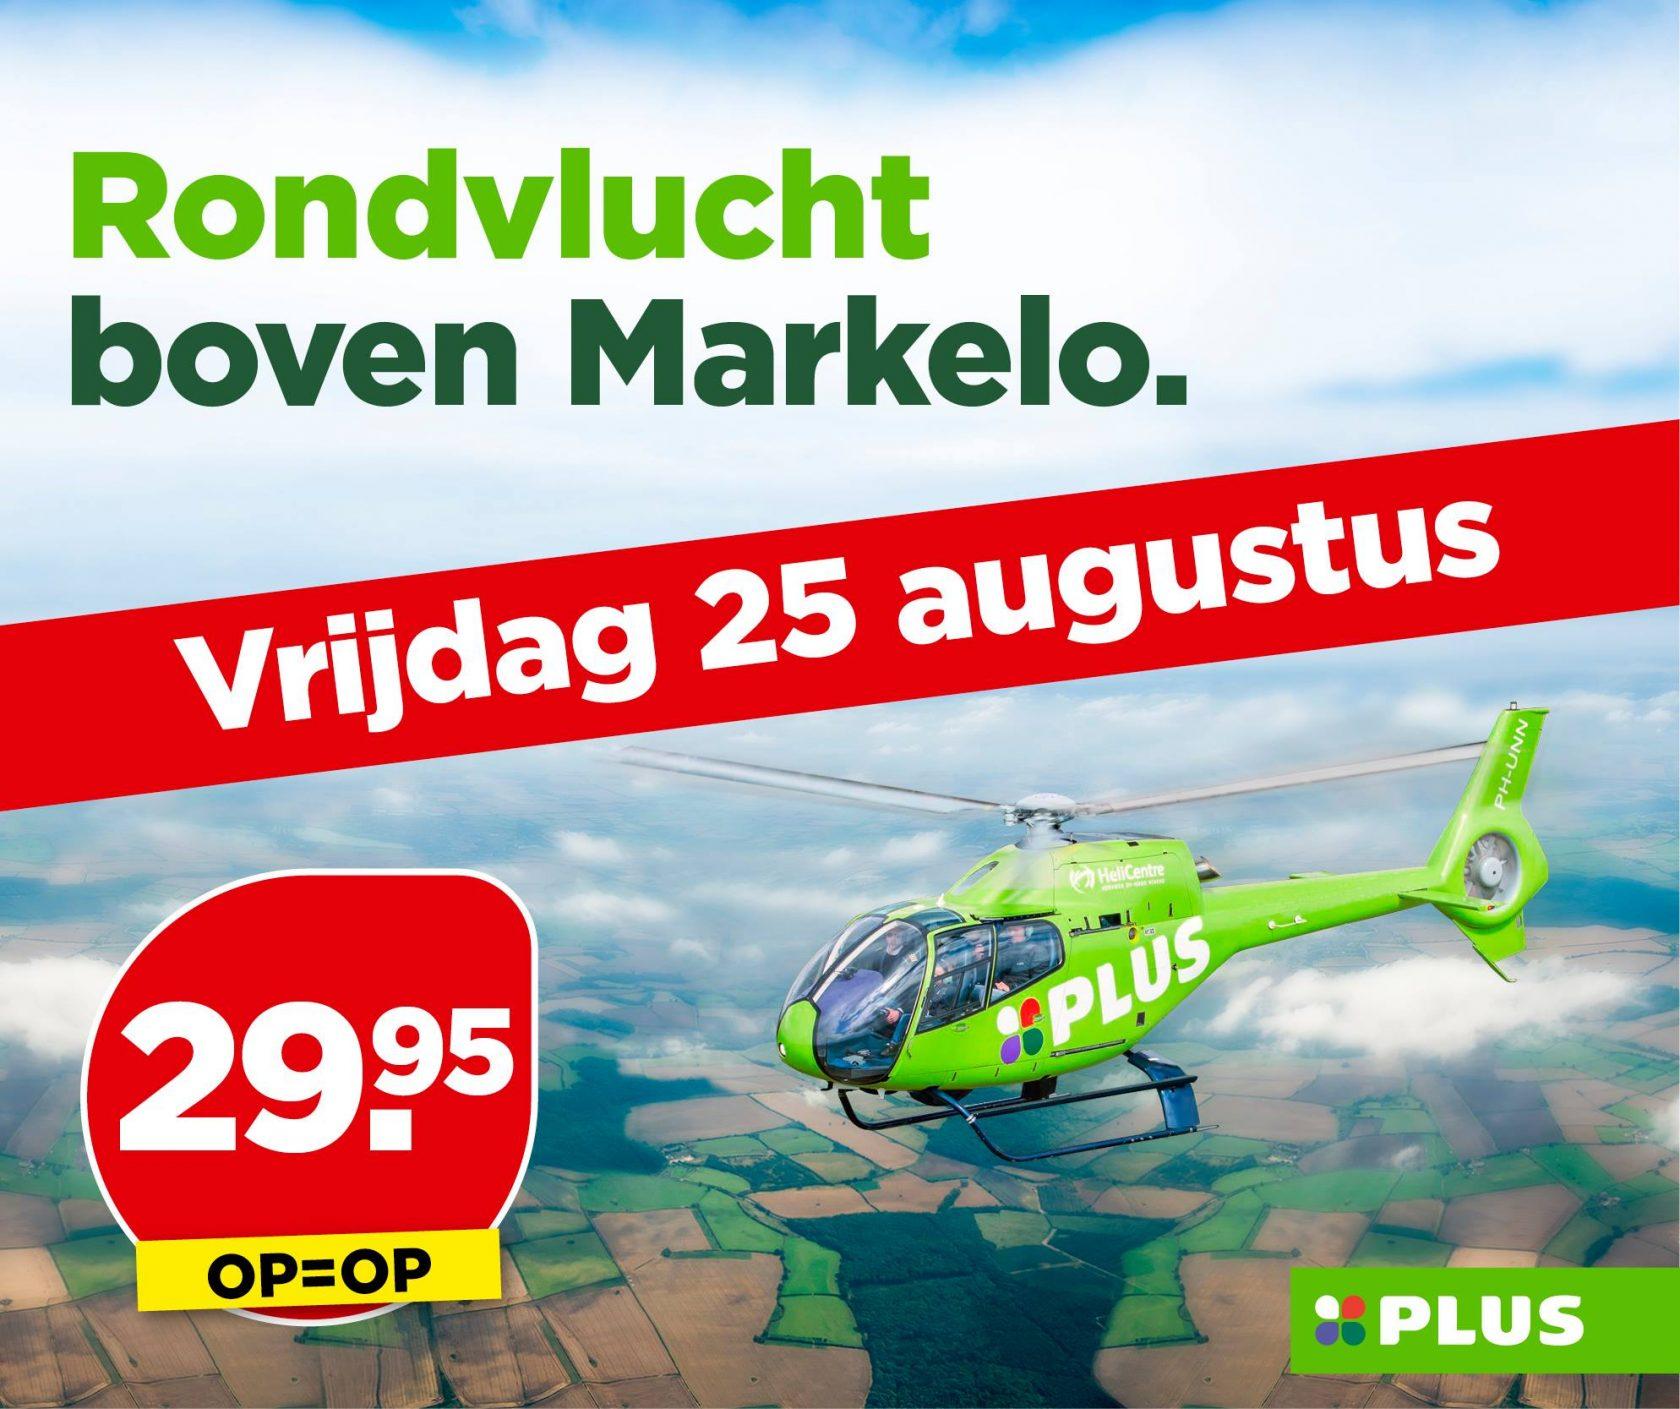 plus-blankhorst-markelo-rondvlucht-helikopter-verzinhet-fotografie-fotostudio